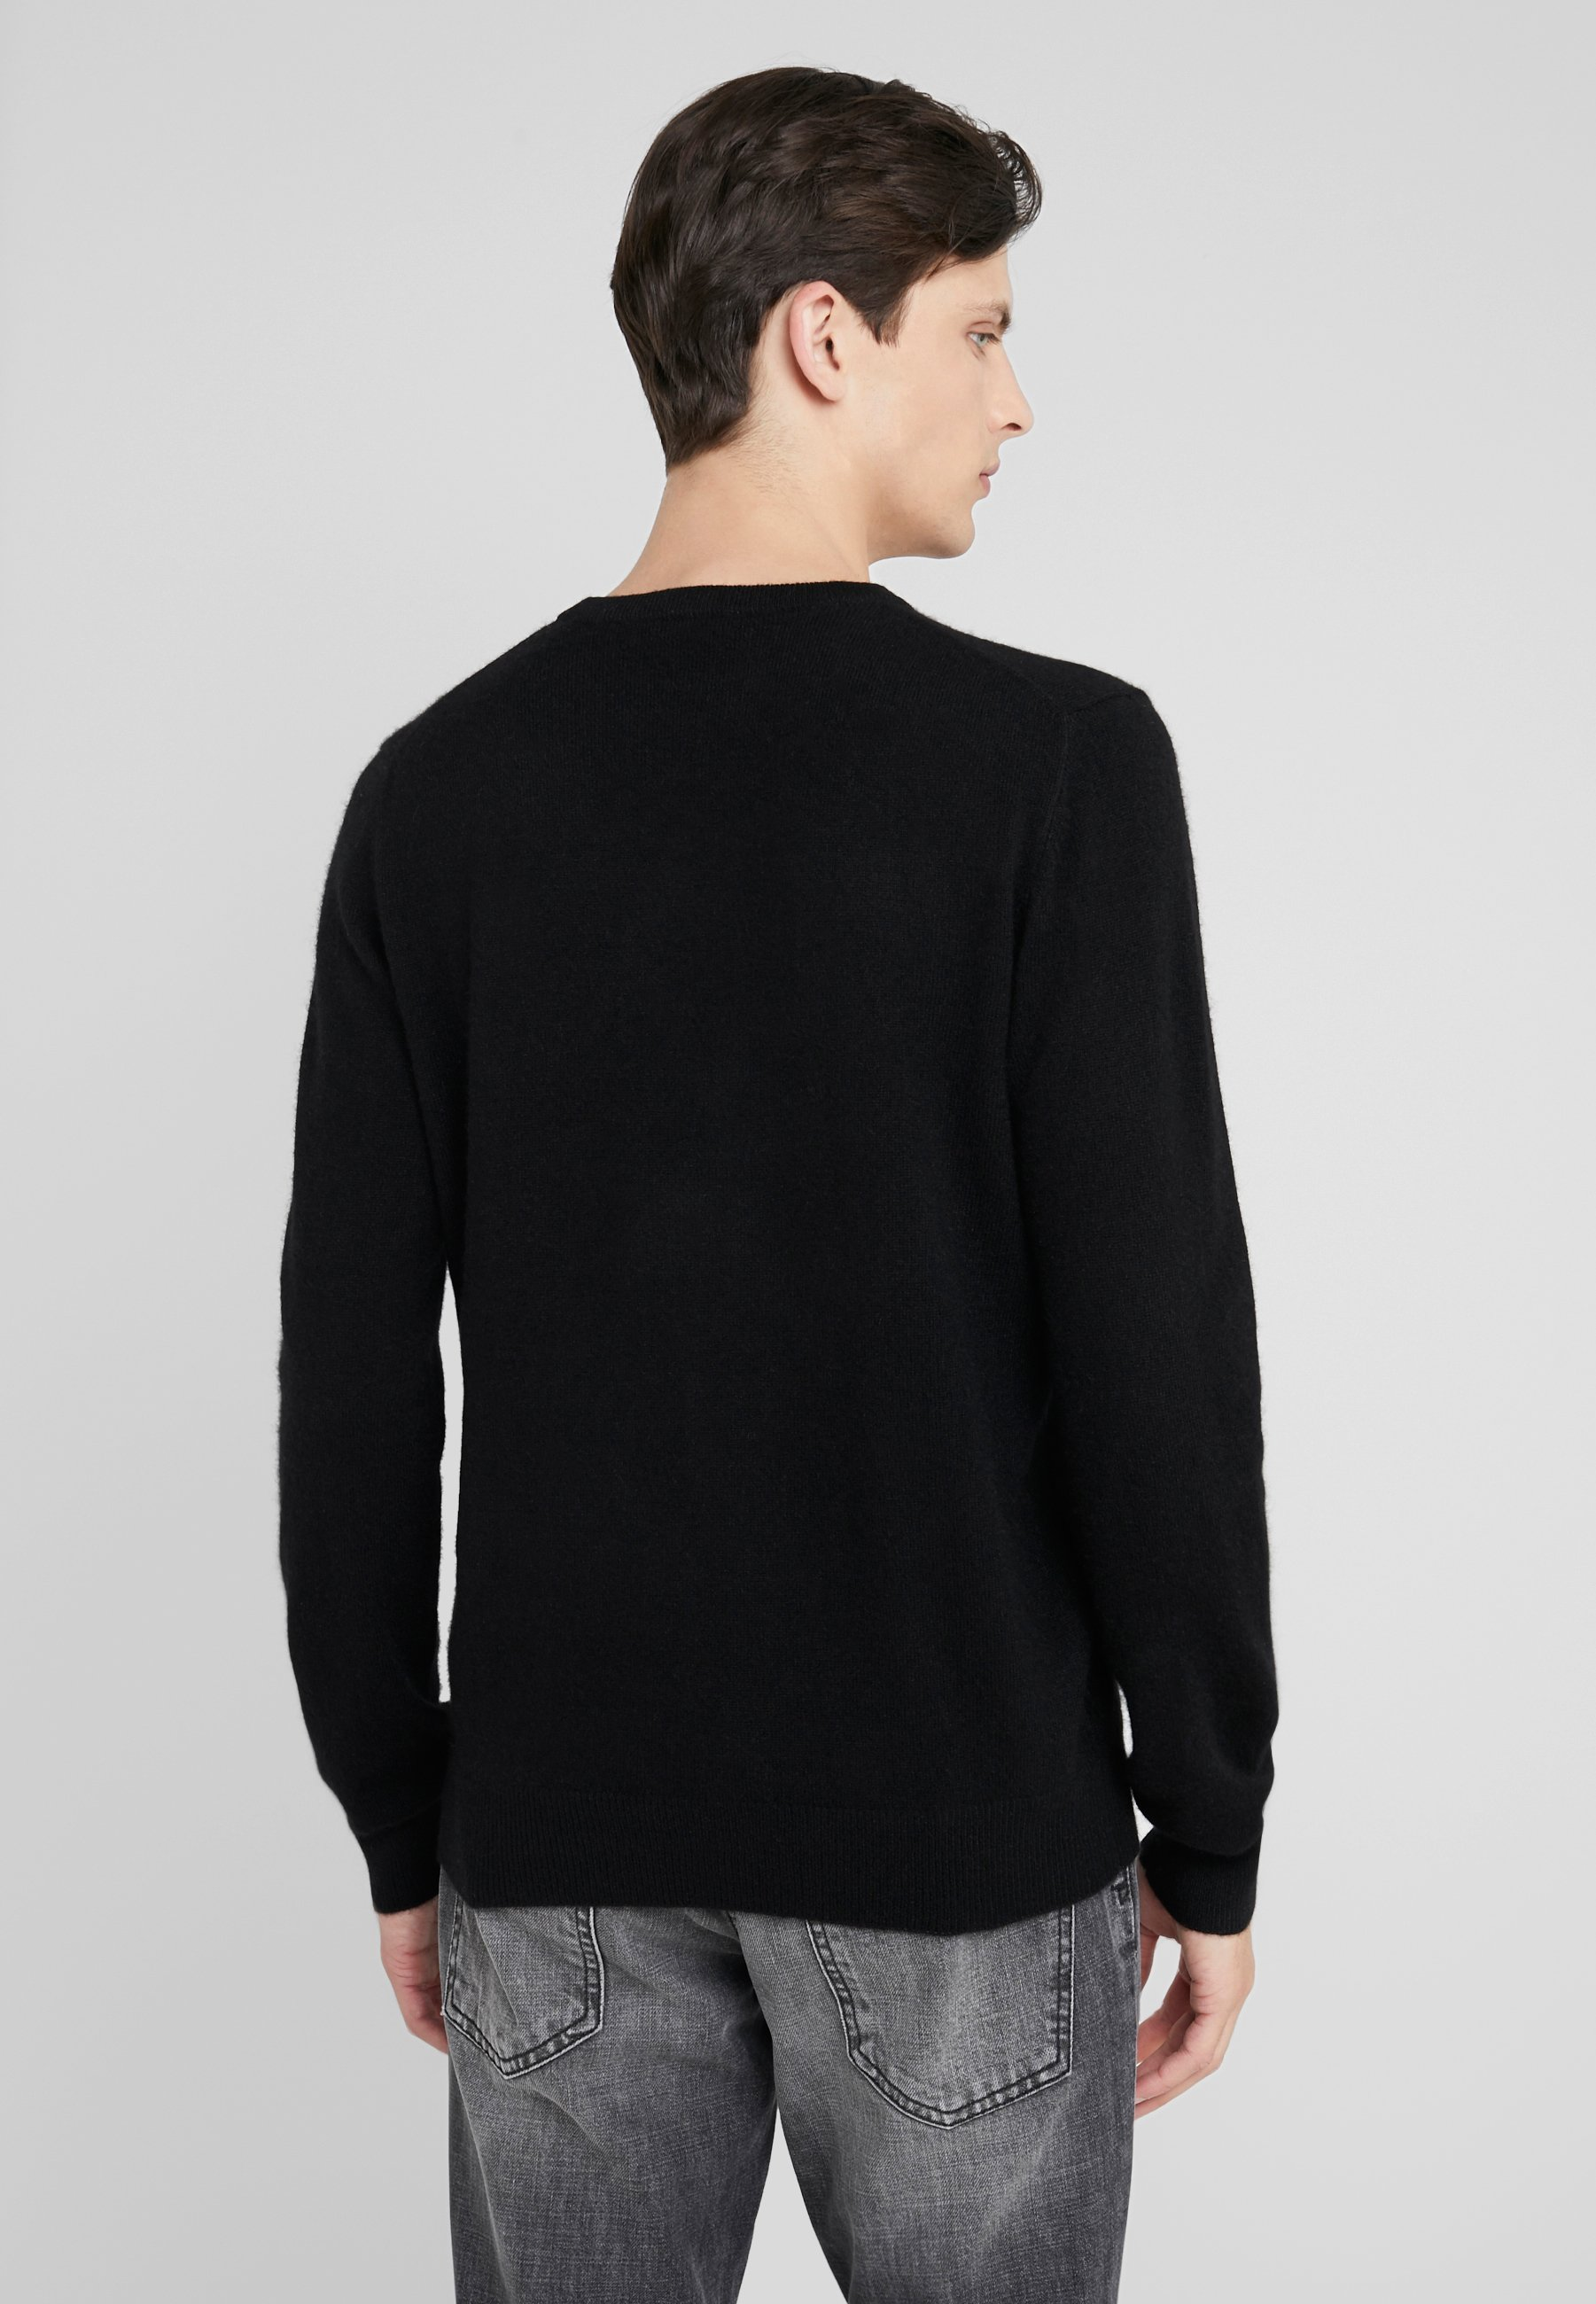 Crew SweaterPullover Pure Mens Neck Black Cashmere hrdCsQt